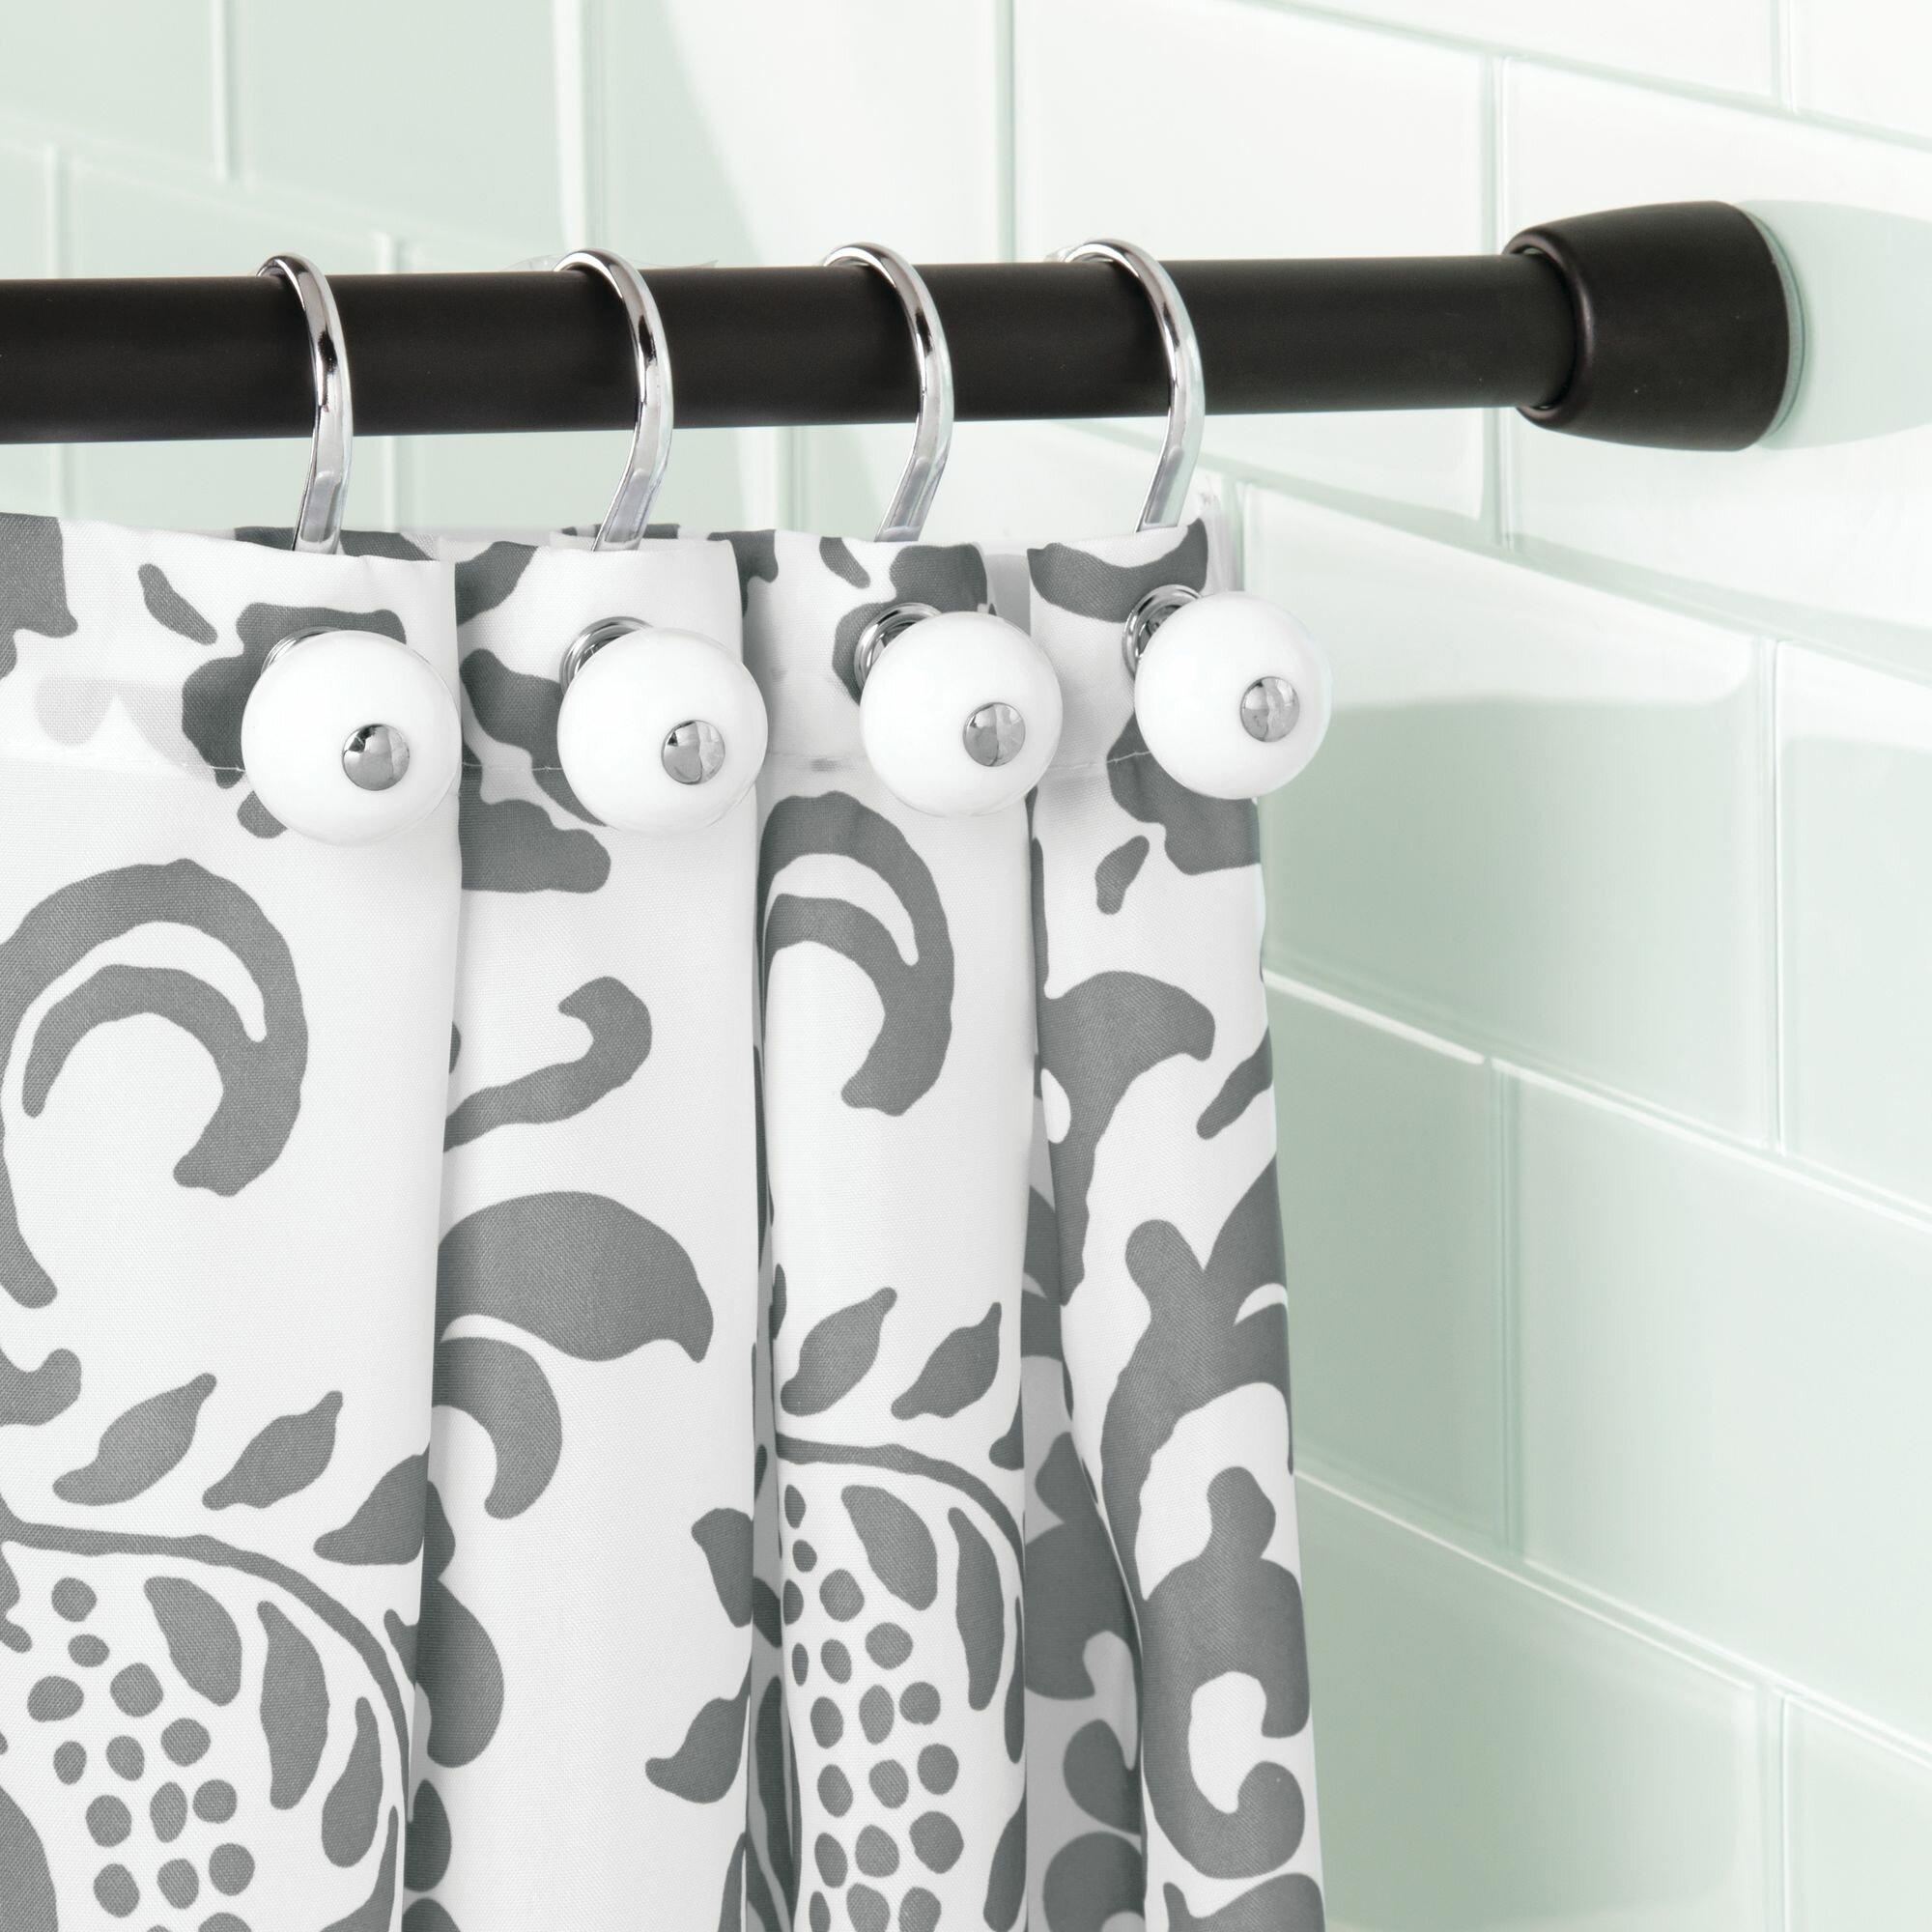 InterDesign Cameo 108 Adjustable Straight Tension Shower Curtain